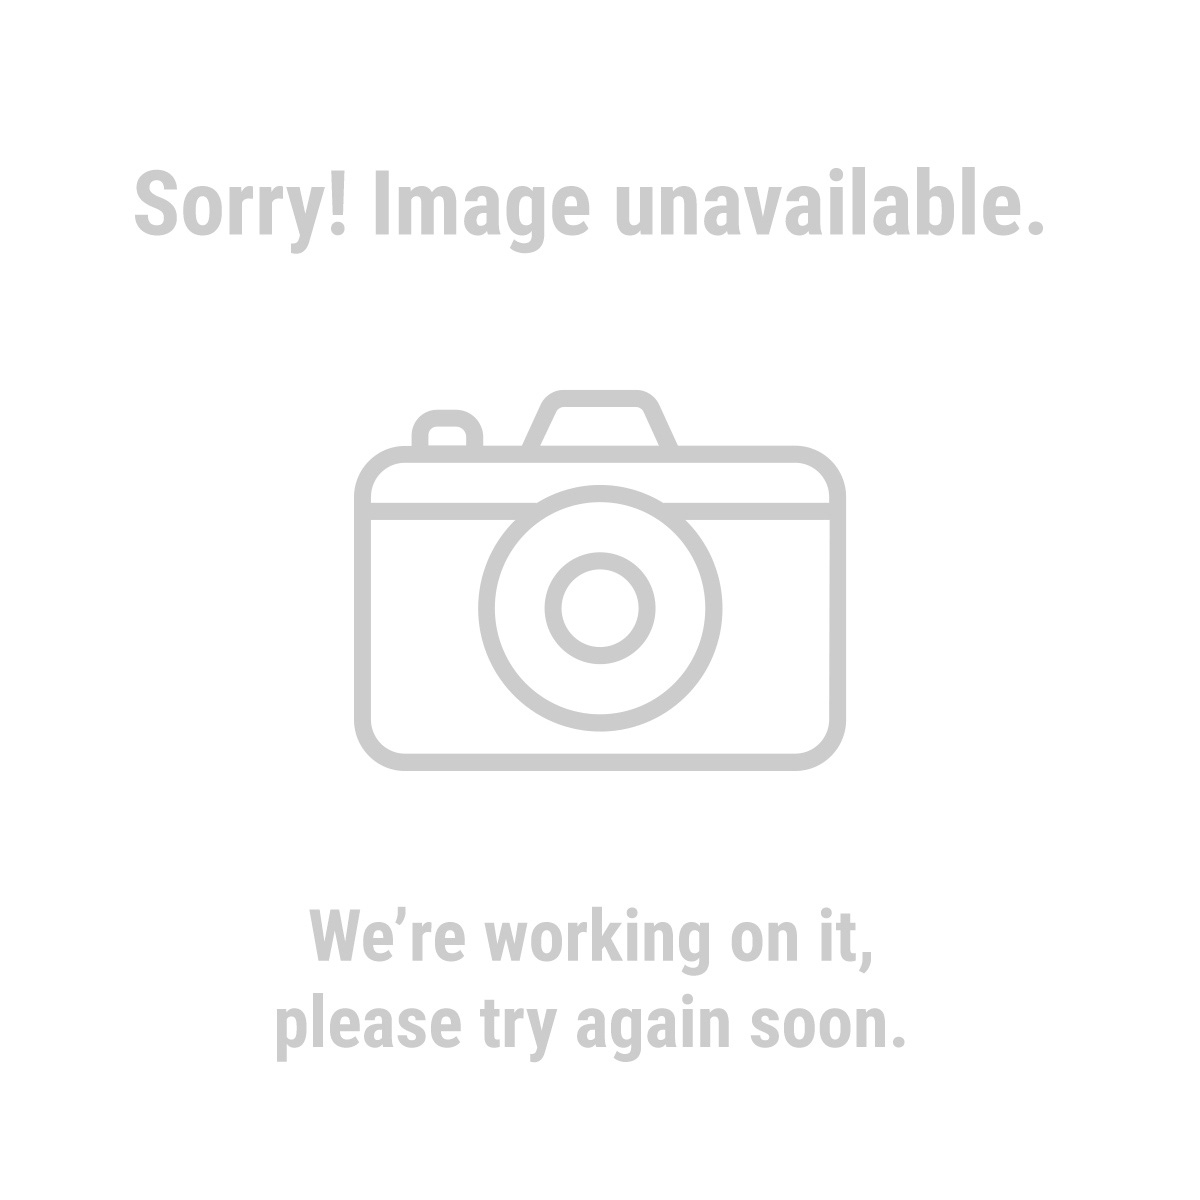 "Haul-Master 36598 72"" x 96"" Full Size Pickup Cargo Net"